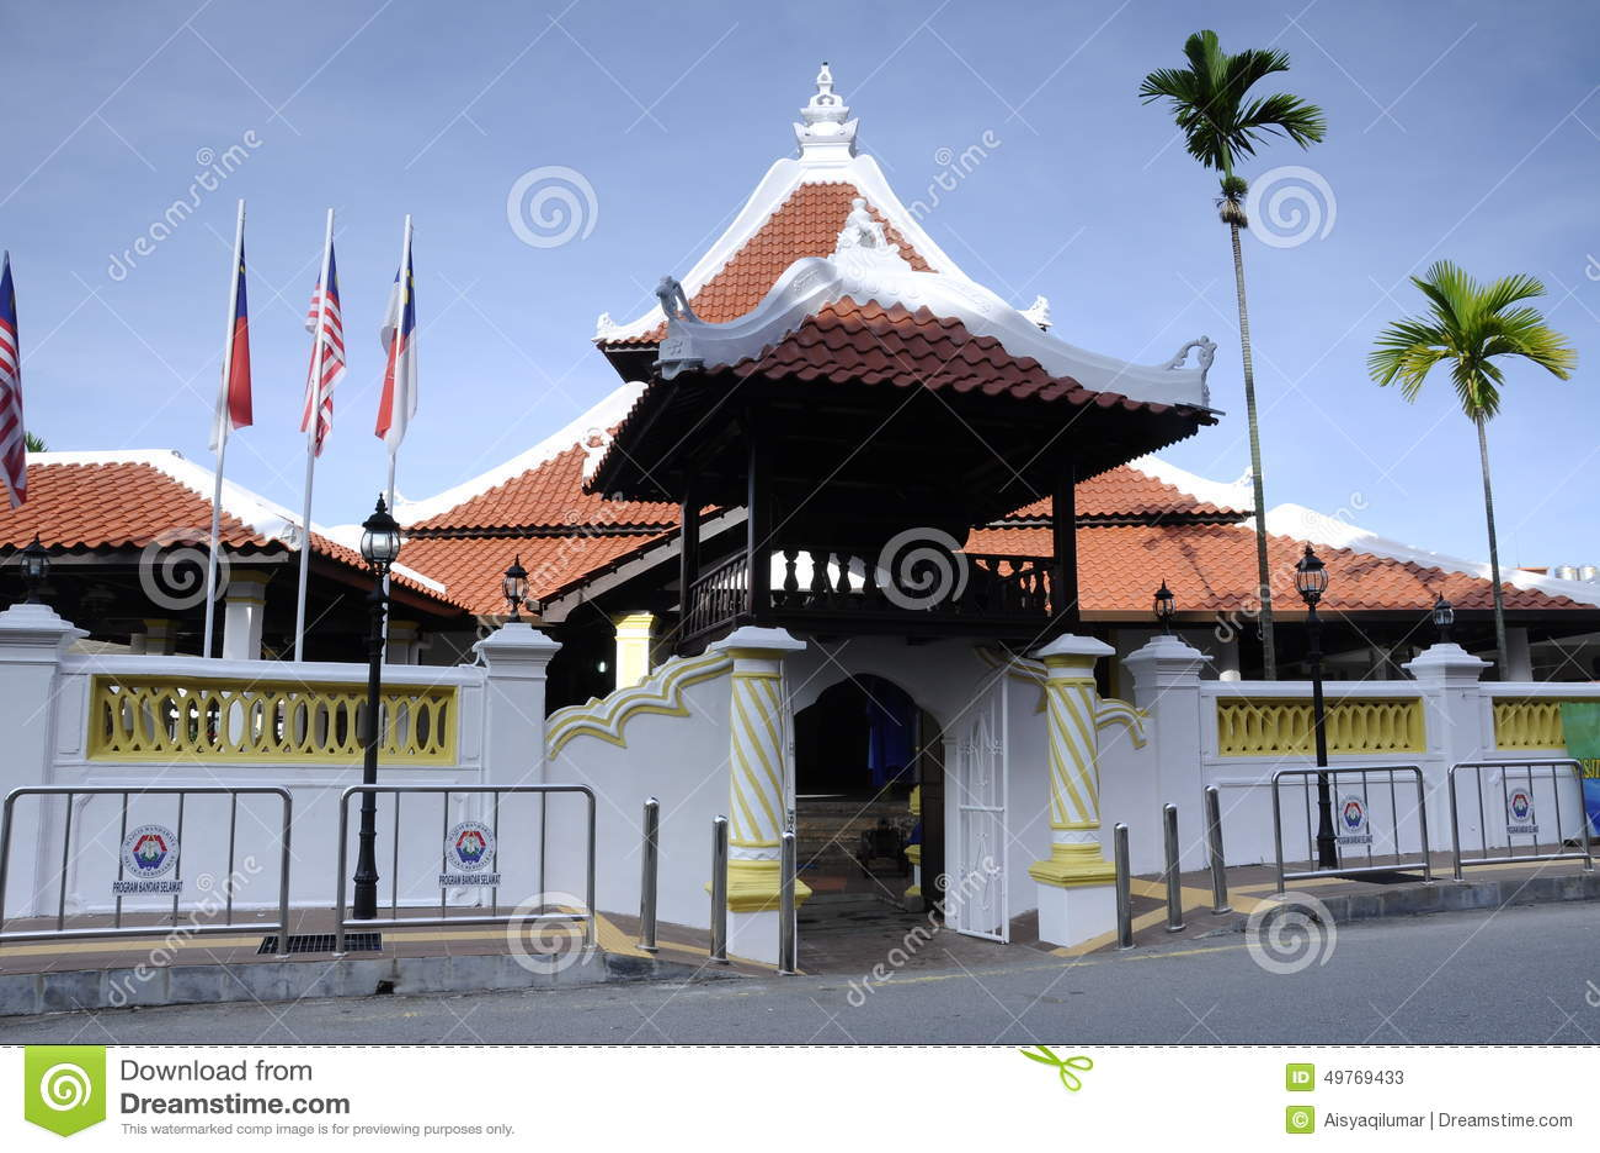 Masjid Kampung Hulu In Malacca Malaysia Stock Image Image Of Exterior Element 49769433